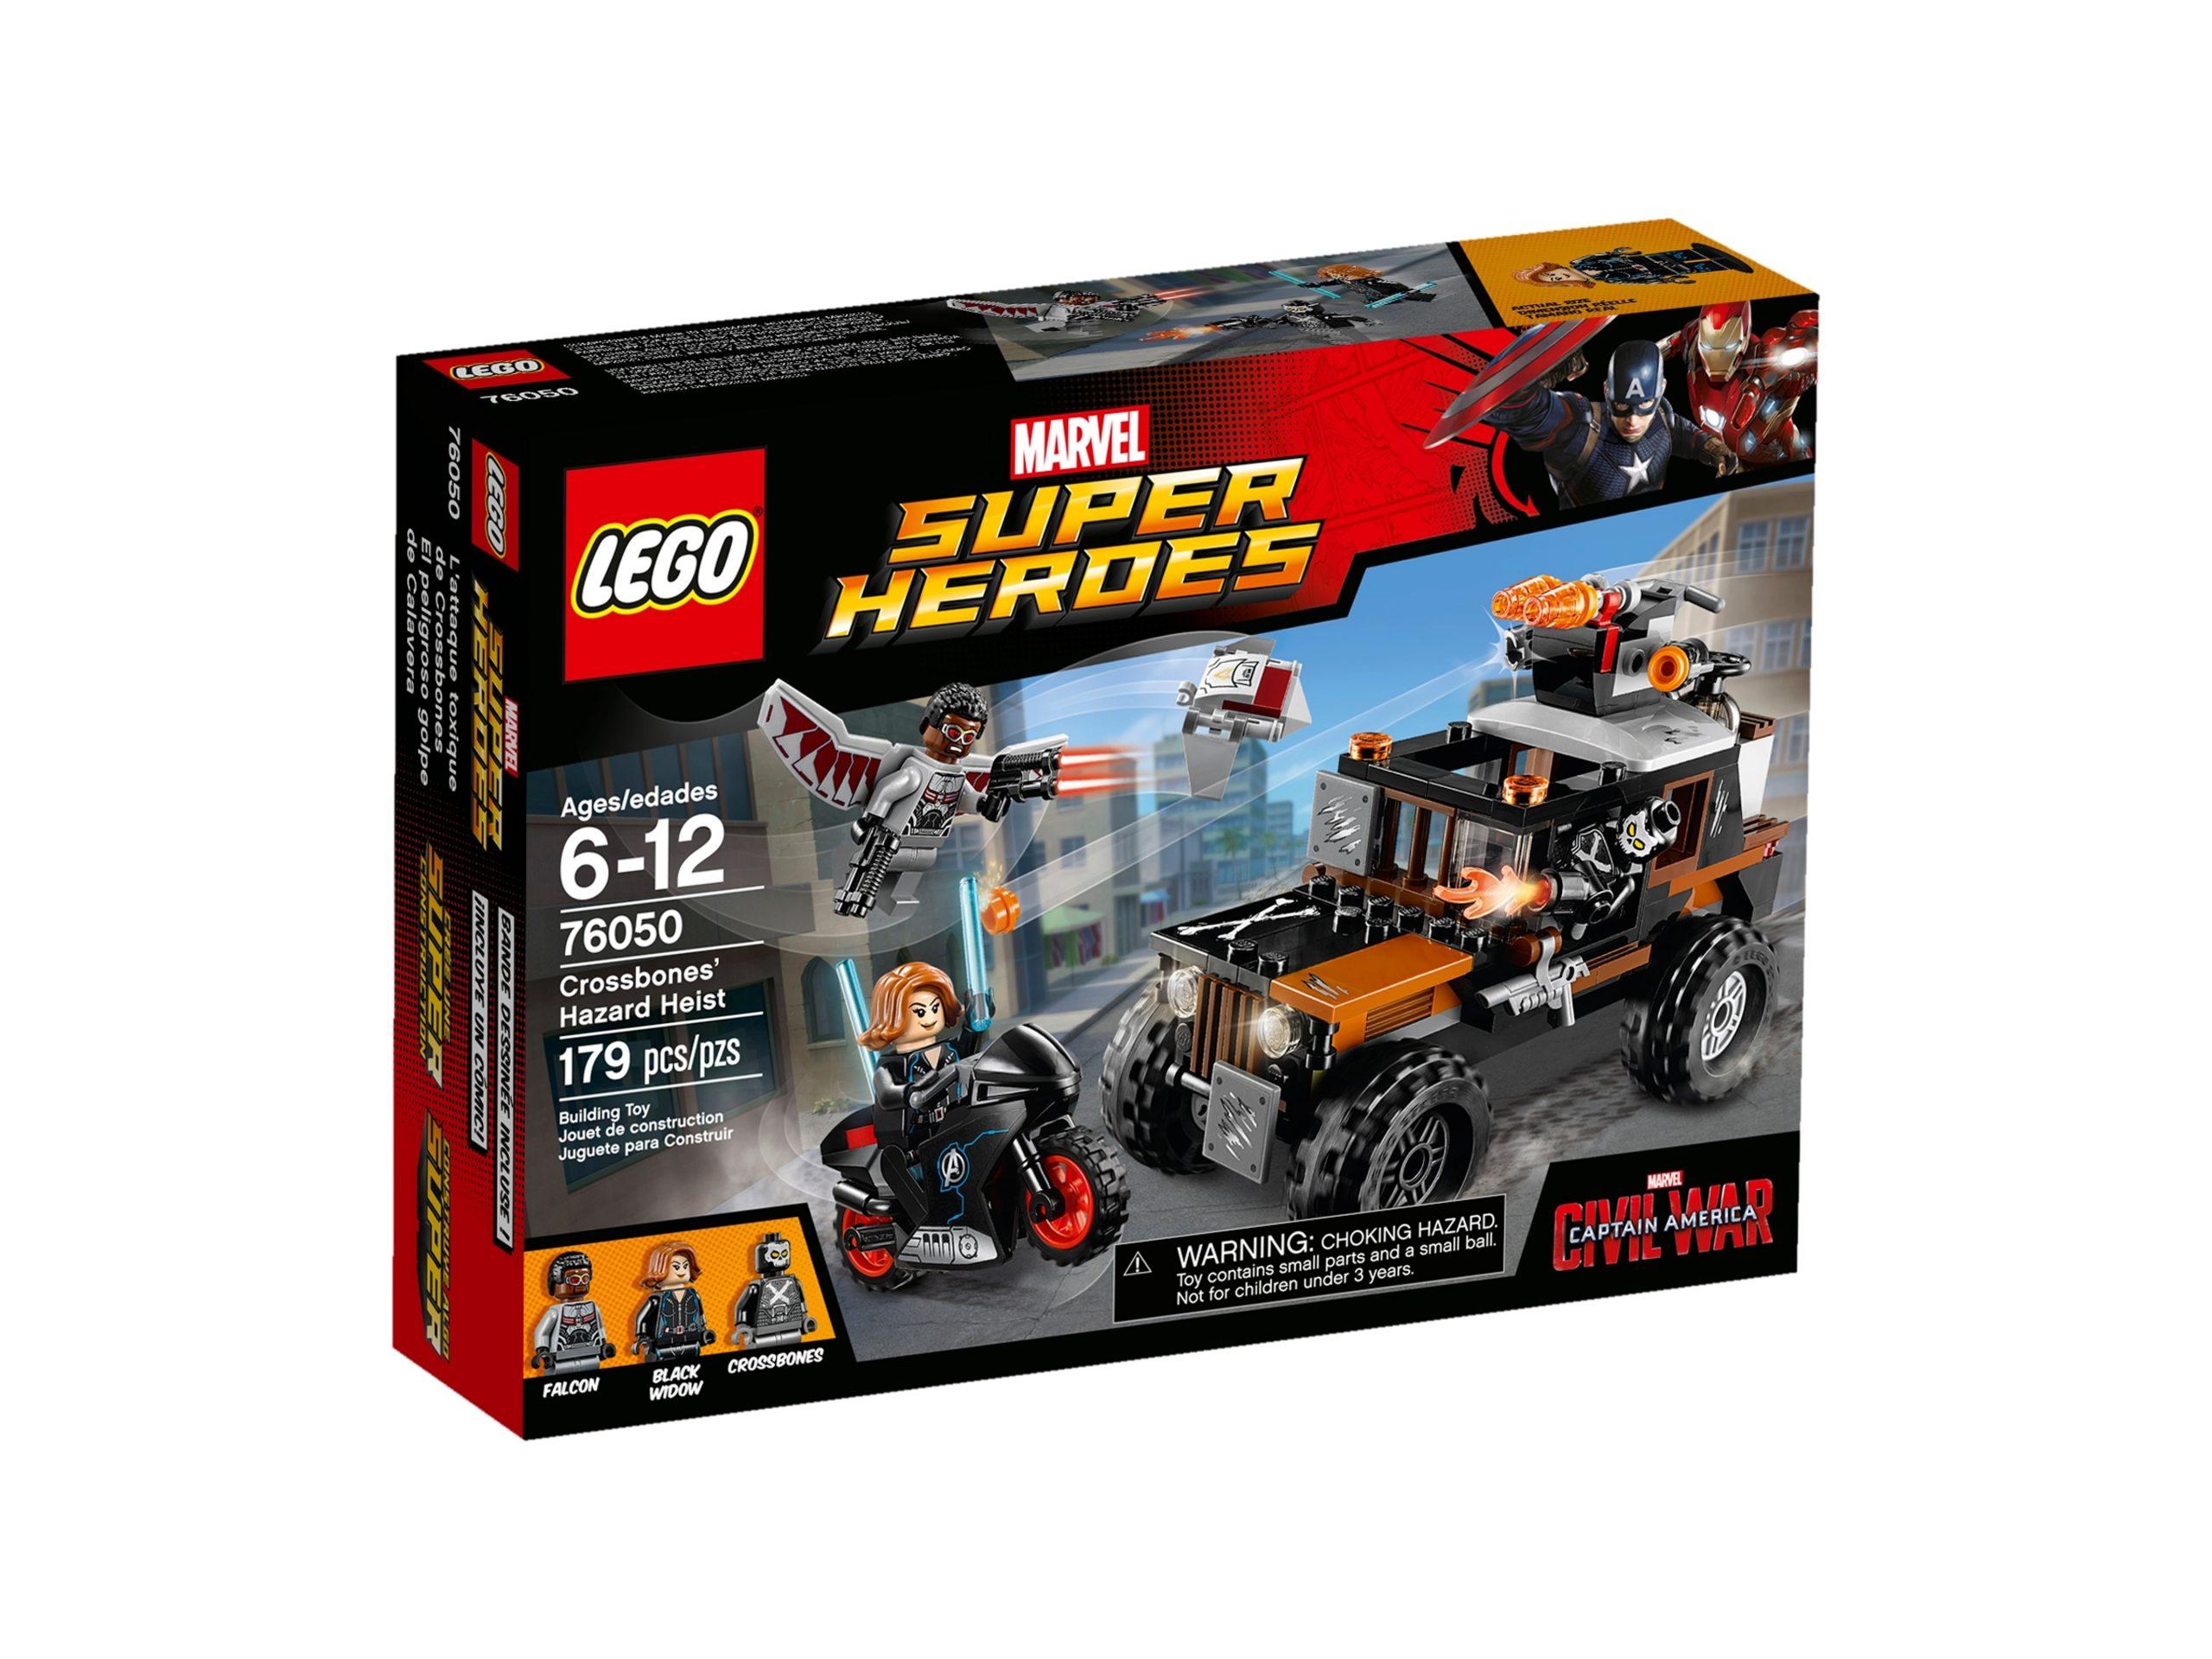 lego 76050 crossbones hazard heist scaled